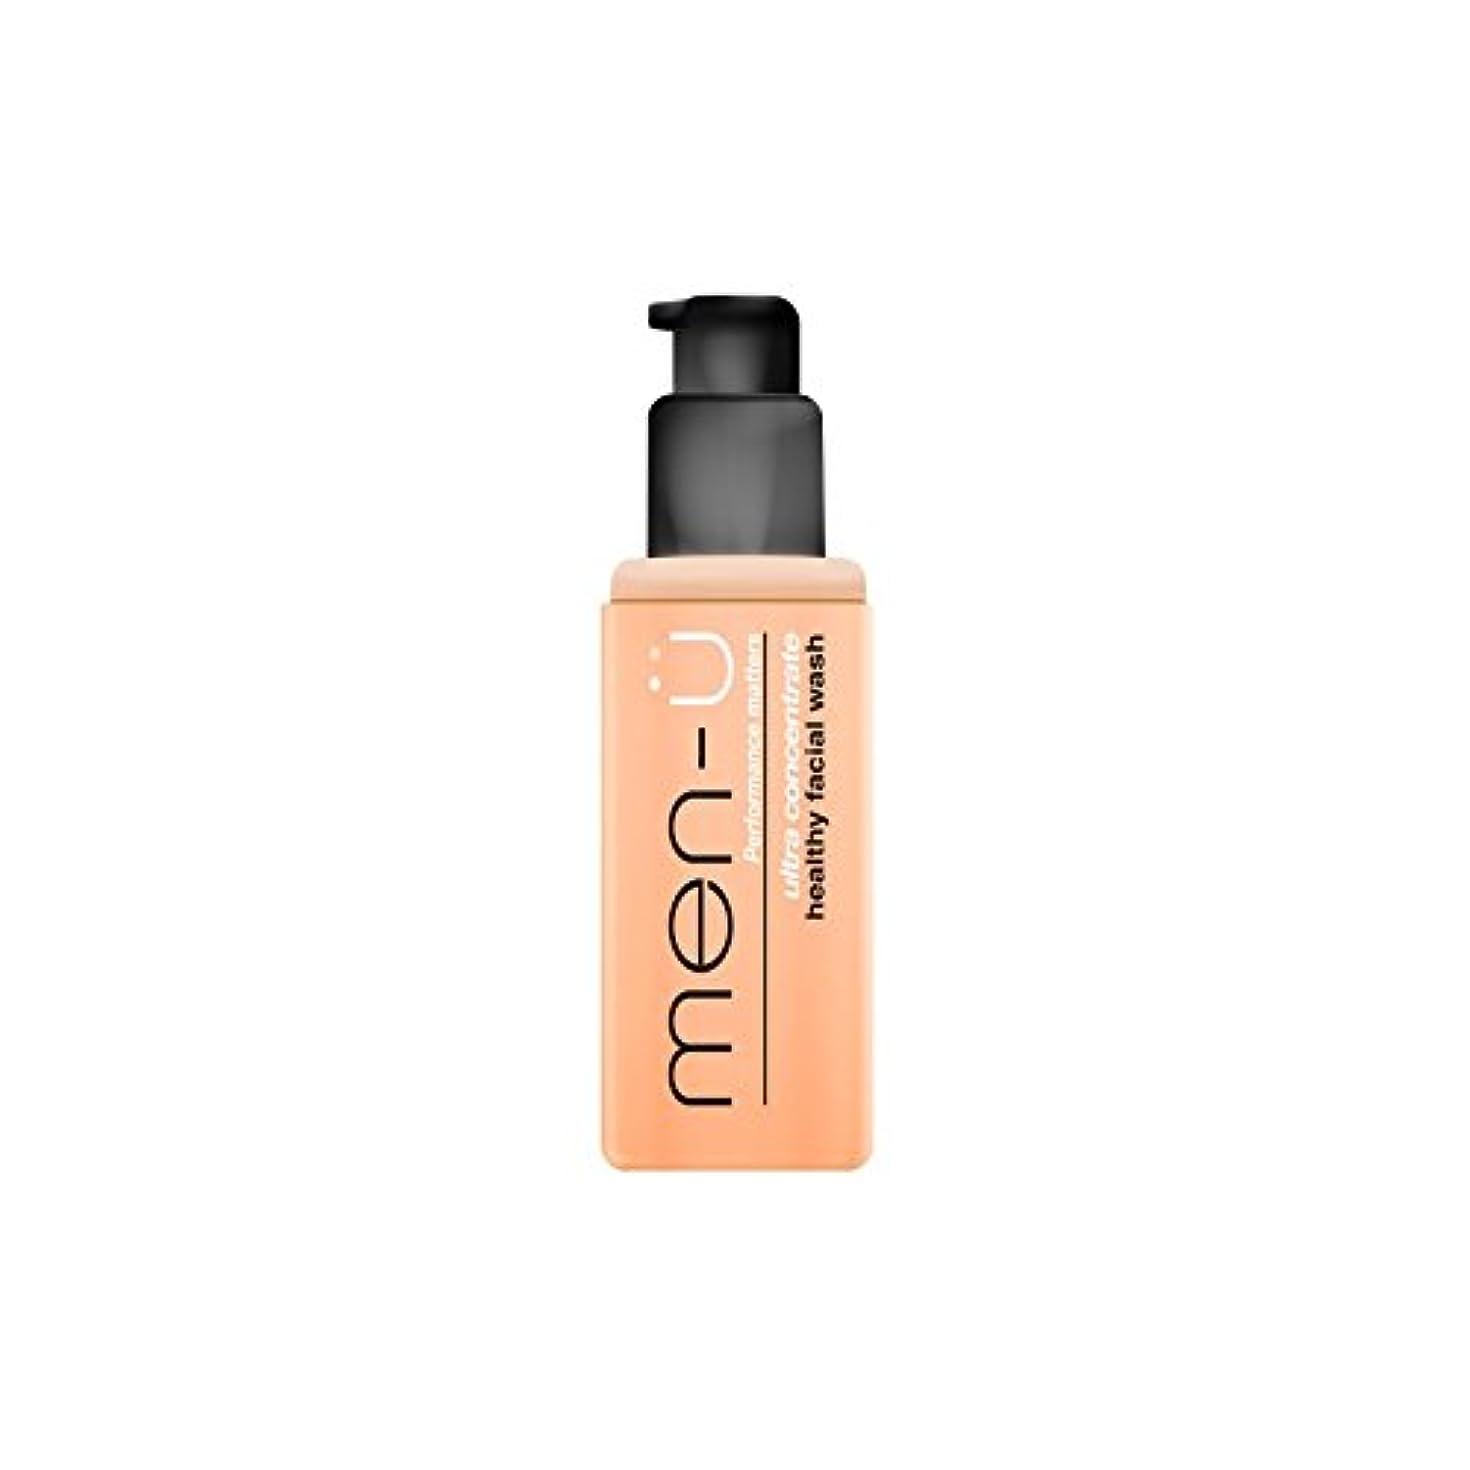 Men-? Healthy Facial Wash (100ml) (Pack of 6) - 男性-?健康洗顔料(100ミリリットル) x6 [並行輸入品]